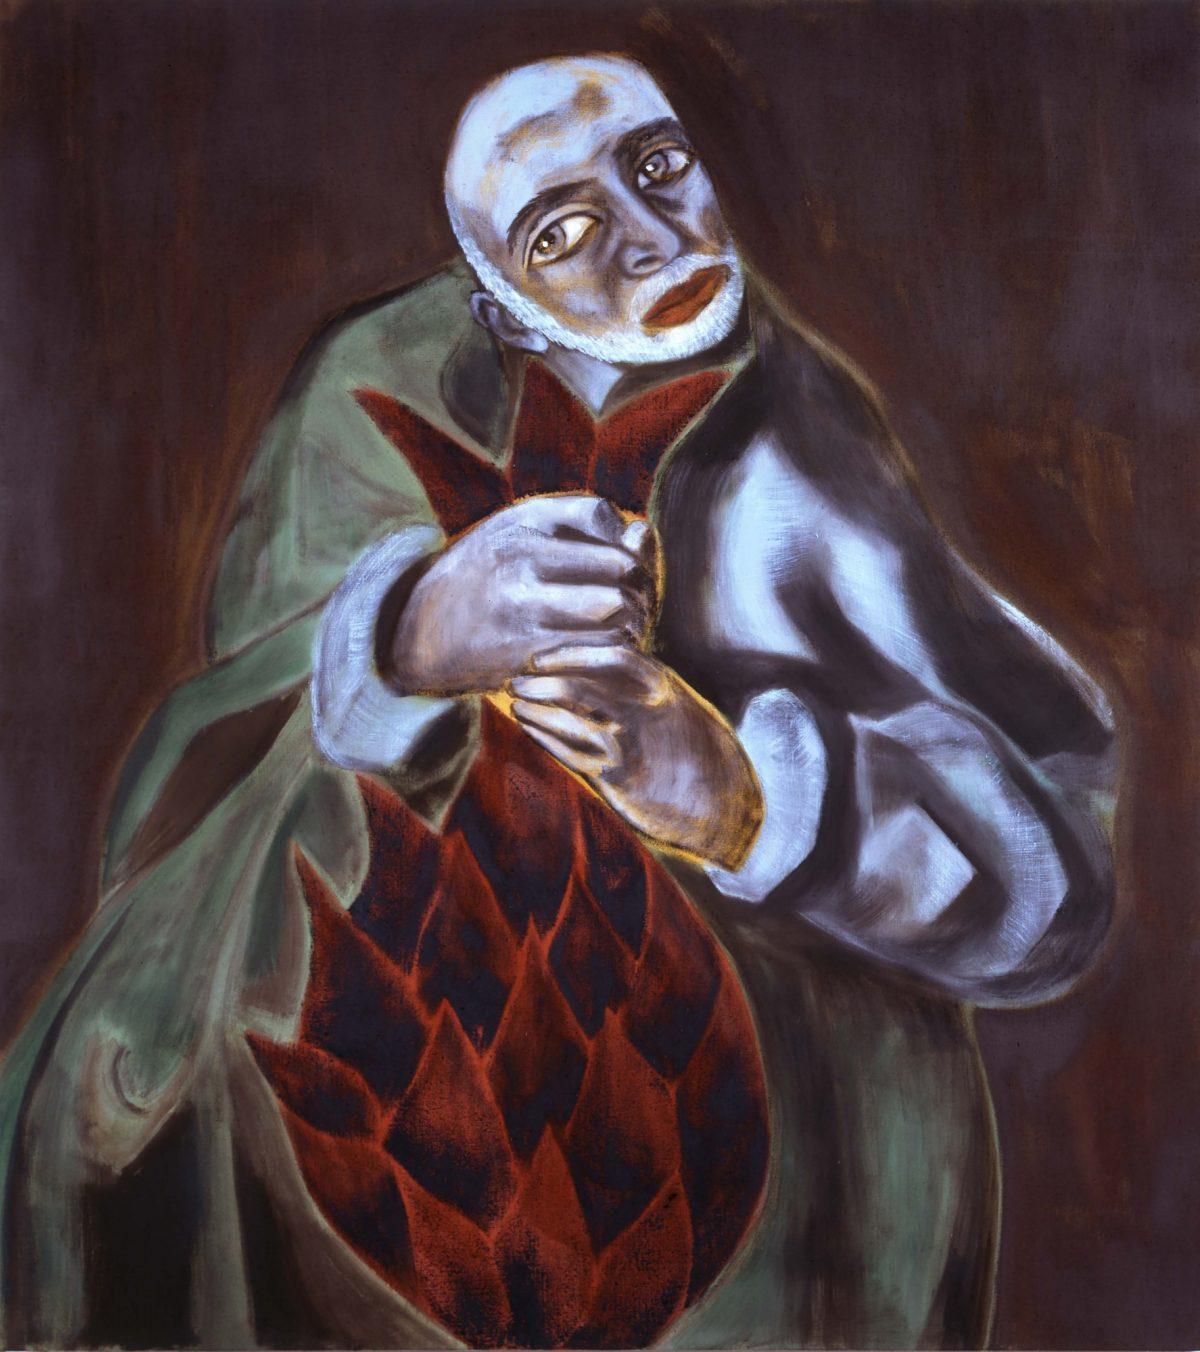 Self-Portrait as St. Thaddeus